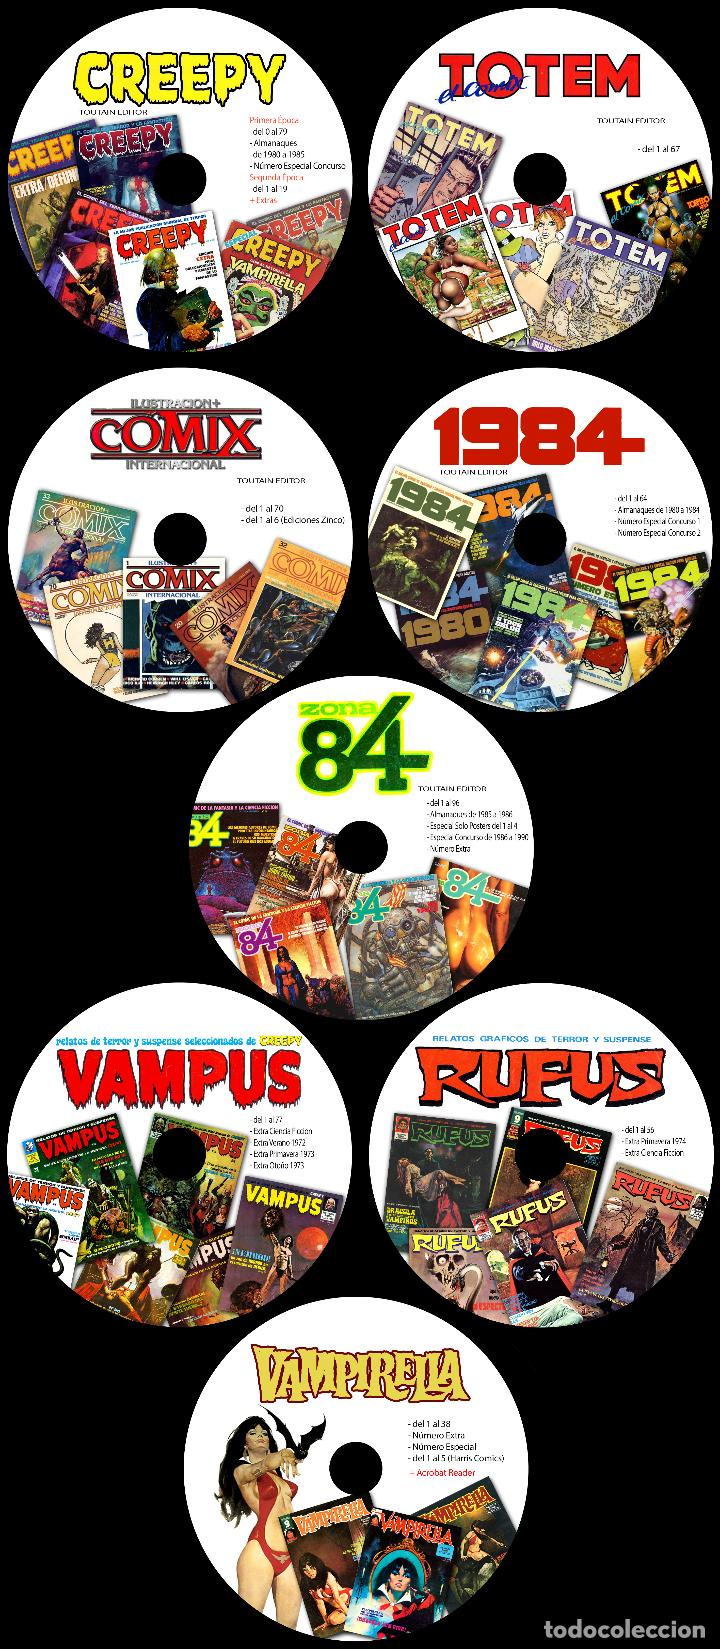 COLECCION TOUTAIN - CREEPY - 1984 - ZONA84 - COMIX INT - TOTEM - 8 DVD'S - VAMPUS - VAMPIRELLA (Tebeos y Comics - Toutain - Otros)